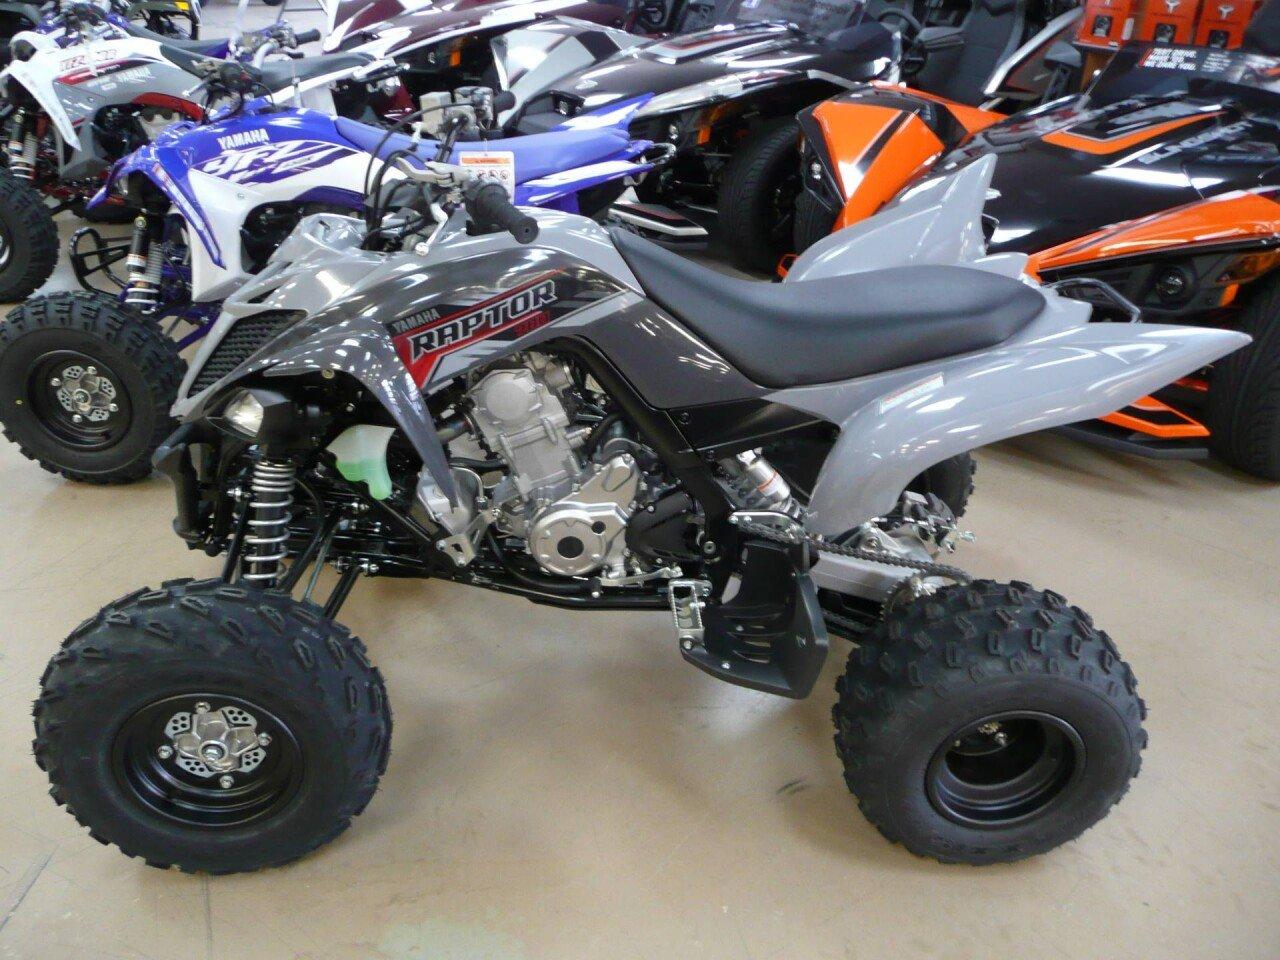 Kbb Value Atv >> 2018 Yamaha Raptor 700 for sale near Unionville, Virginia 22567 - Motorcycles on Autotrader